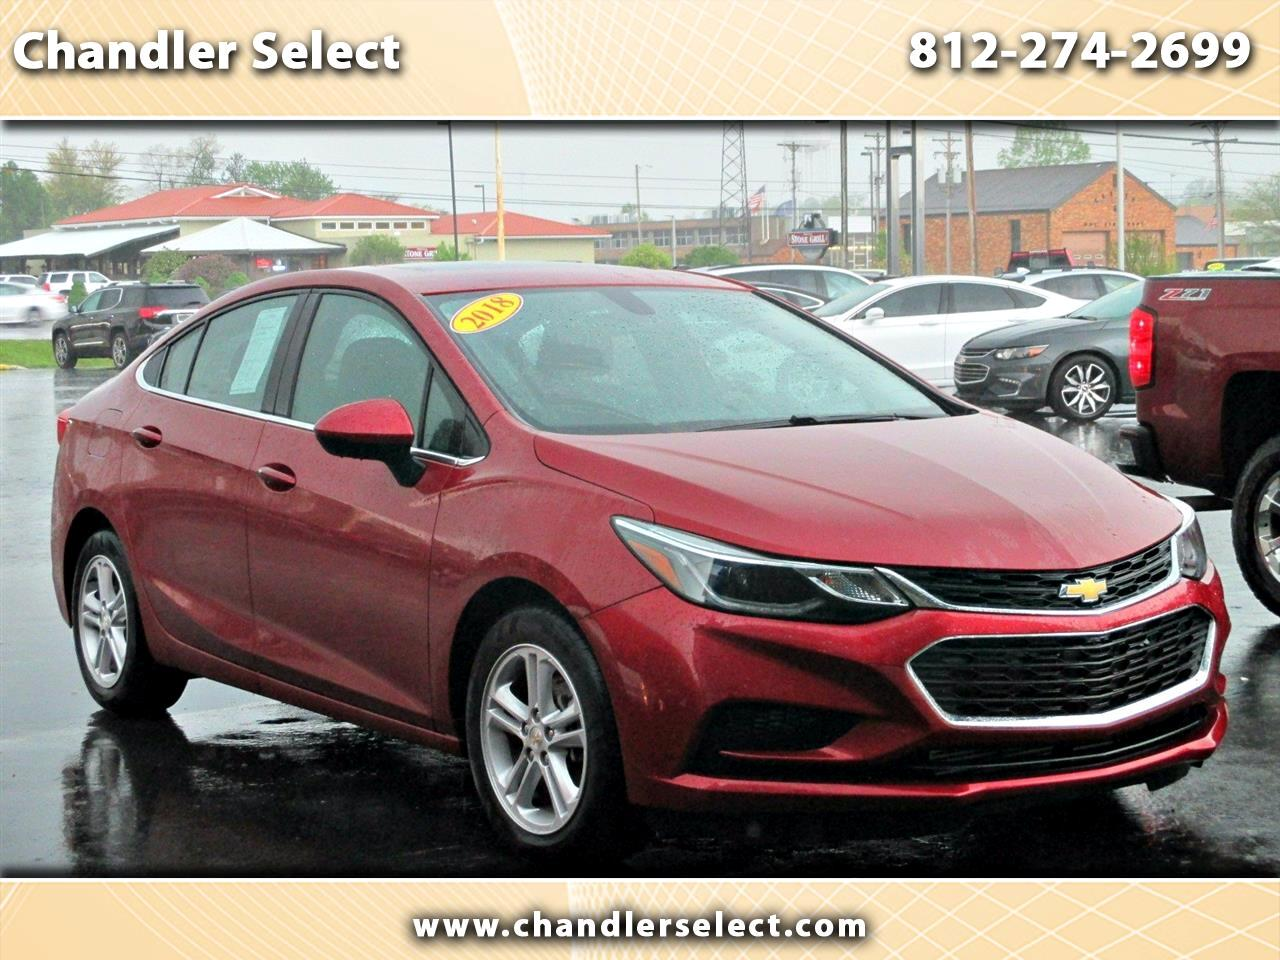 Chevrolet Cruze 4dr Sdn 1.4L LT w/1SD 2018